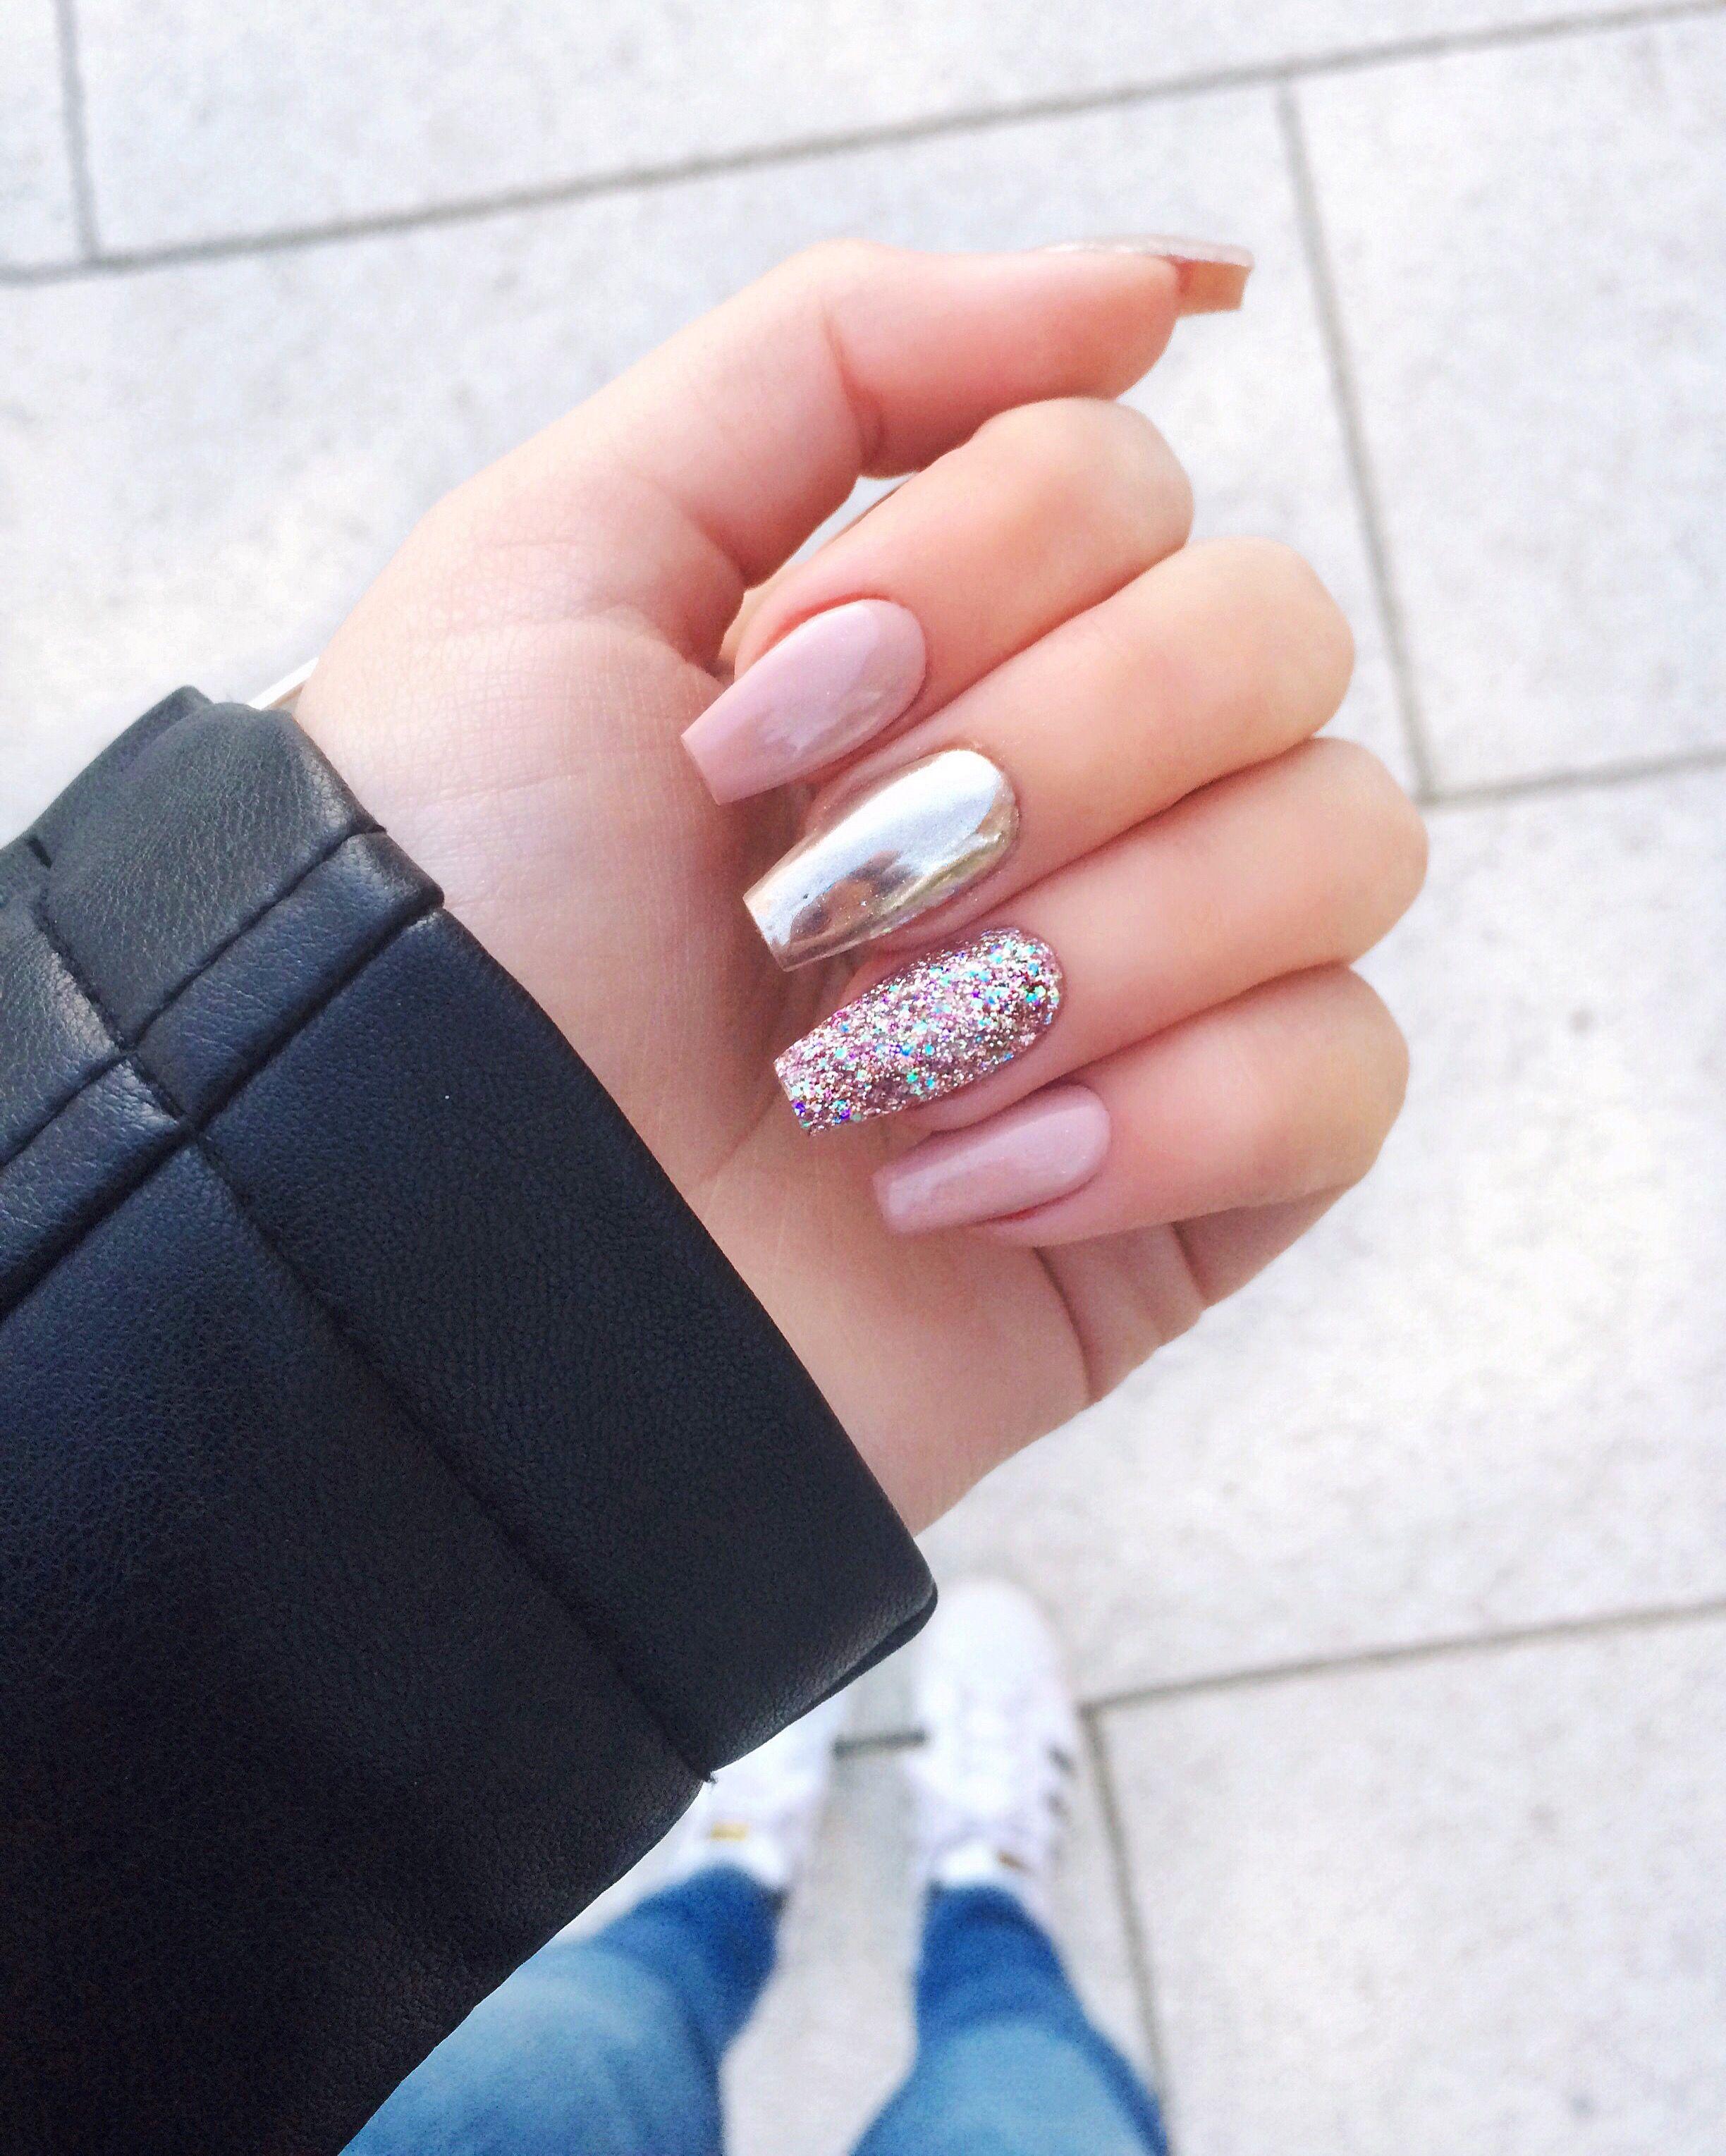 Pink chrome glitter nails claws pinterest glitter nails pink chrome glitter nails prinsesfo Images